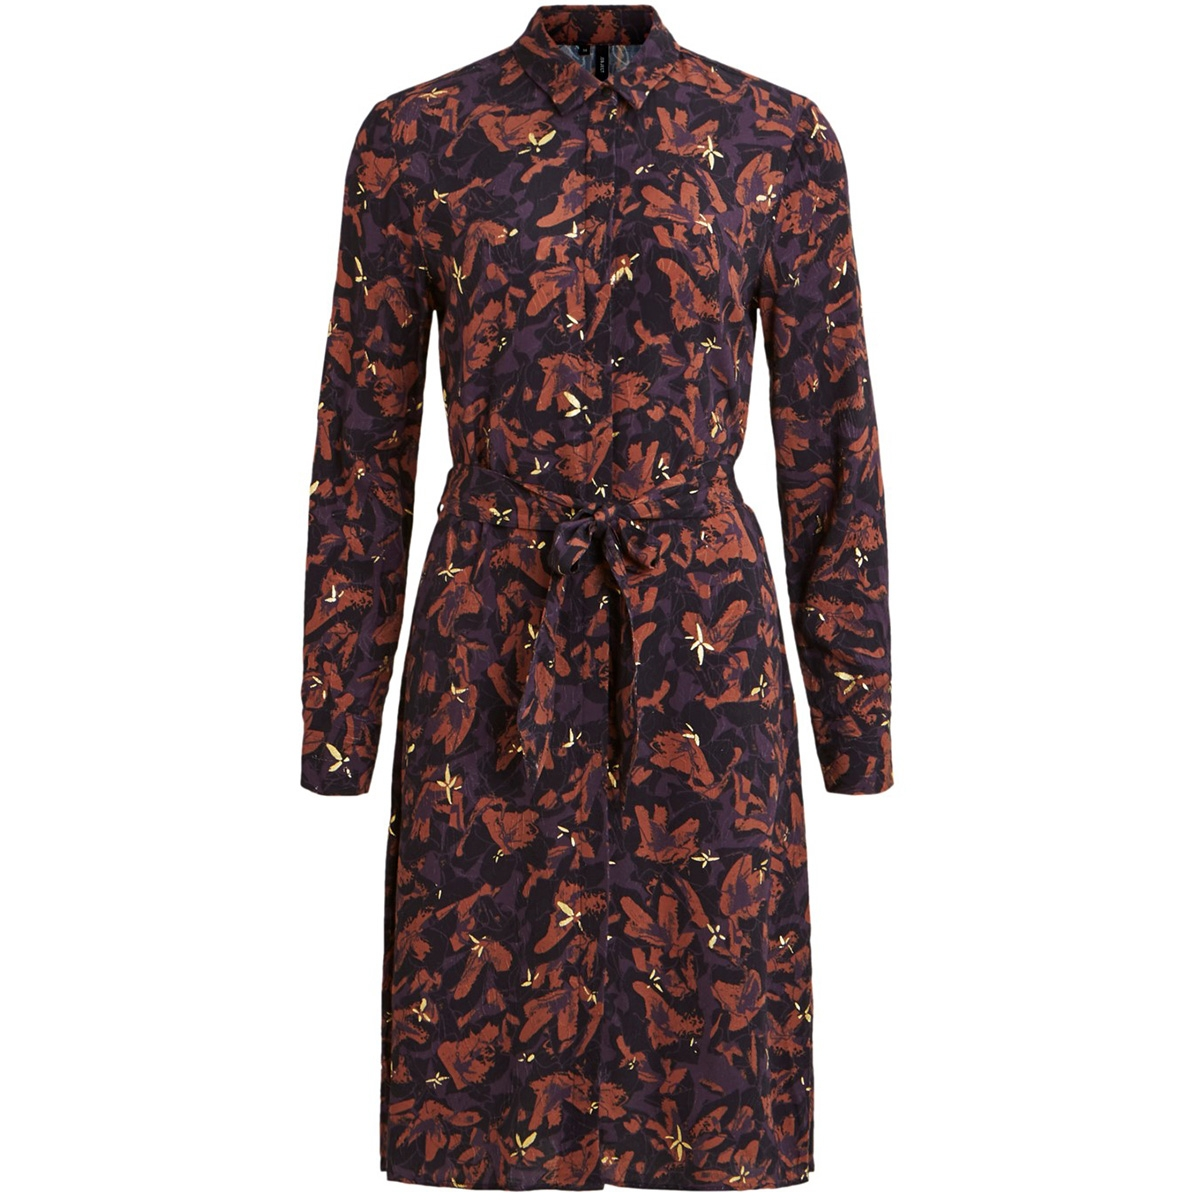 objelma lonnie ls dress 106 23031108 object jurk nightshade/aop